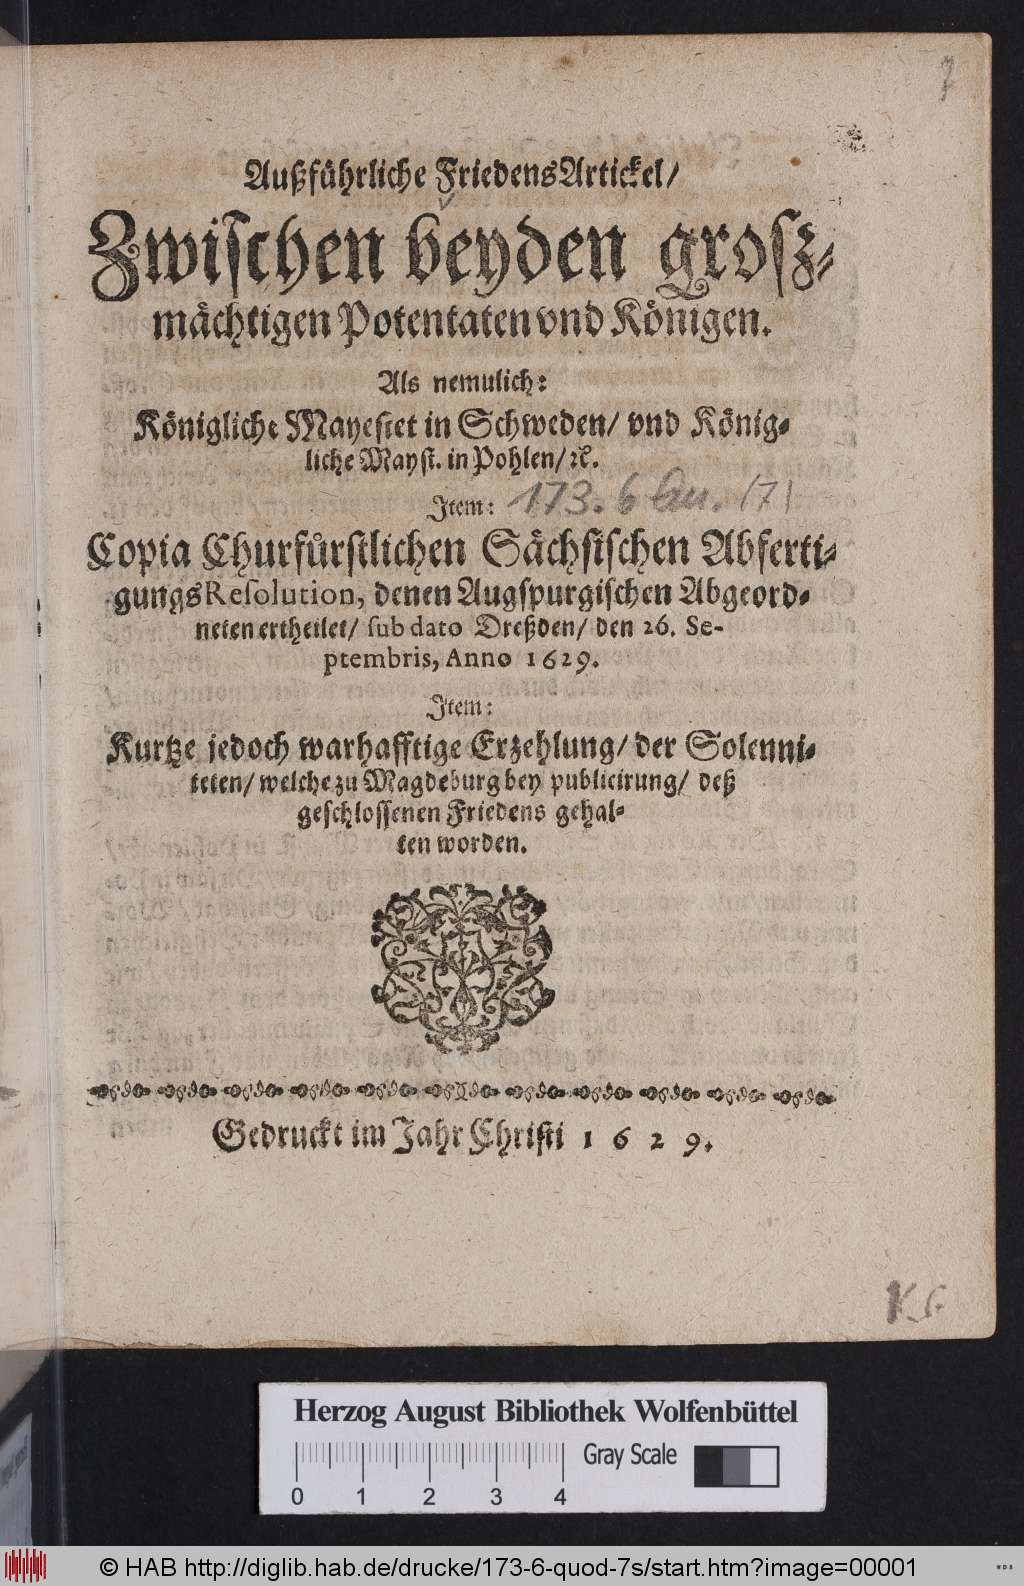 http://diglib.hab.de/drucke/173-6-quod-7s/00001.jpg